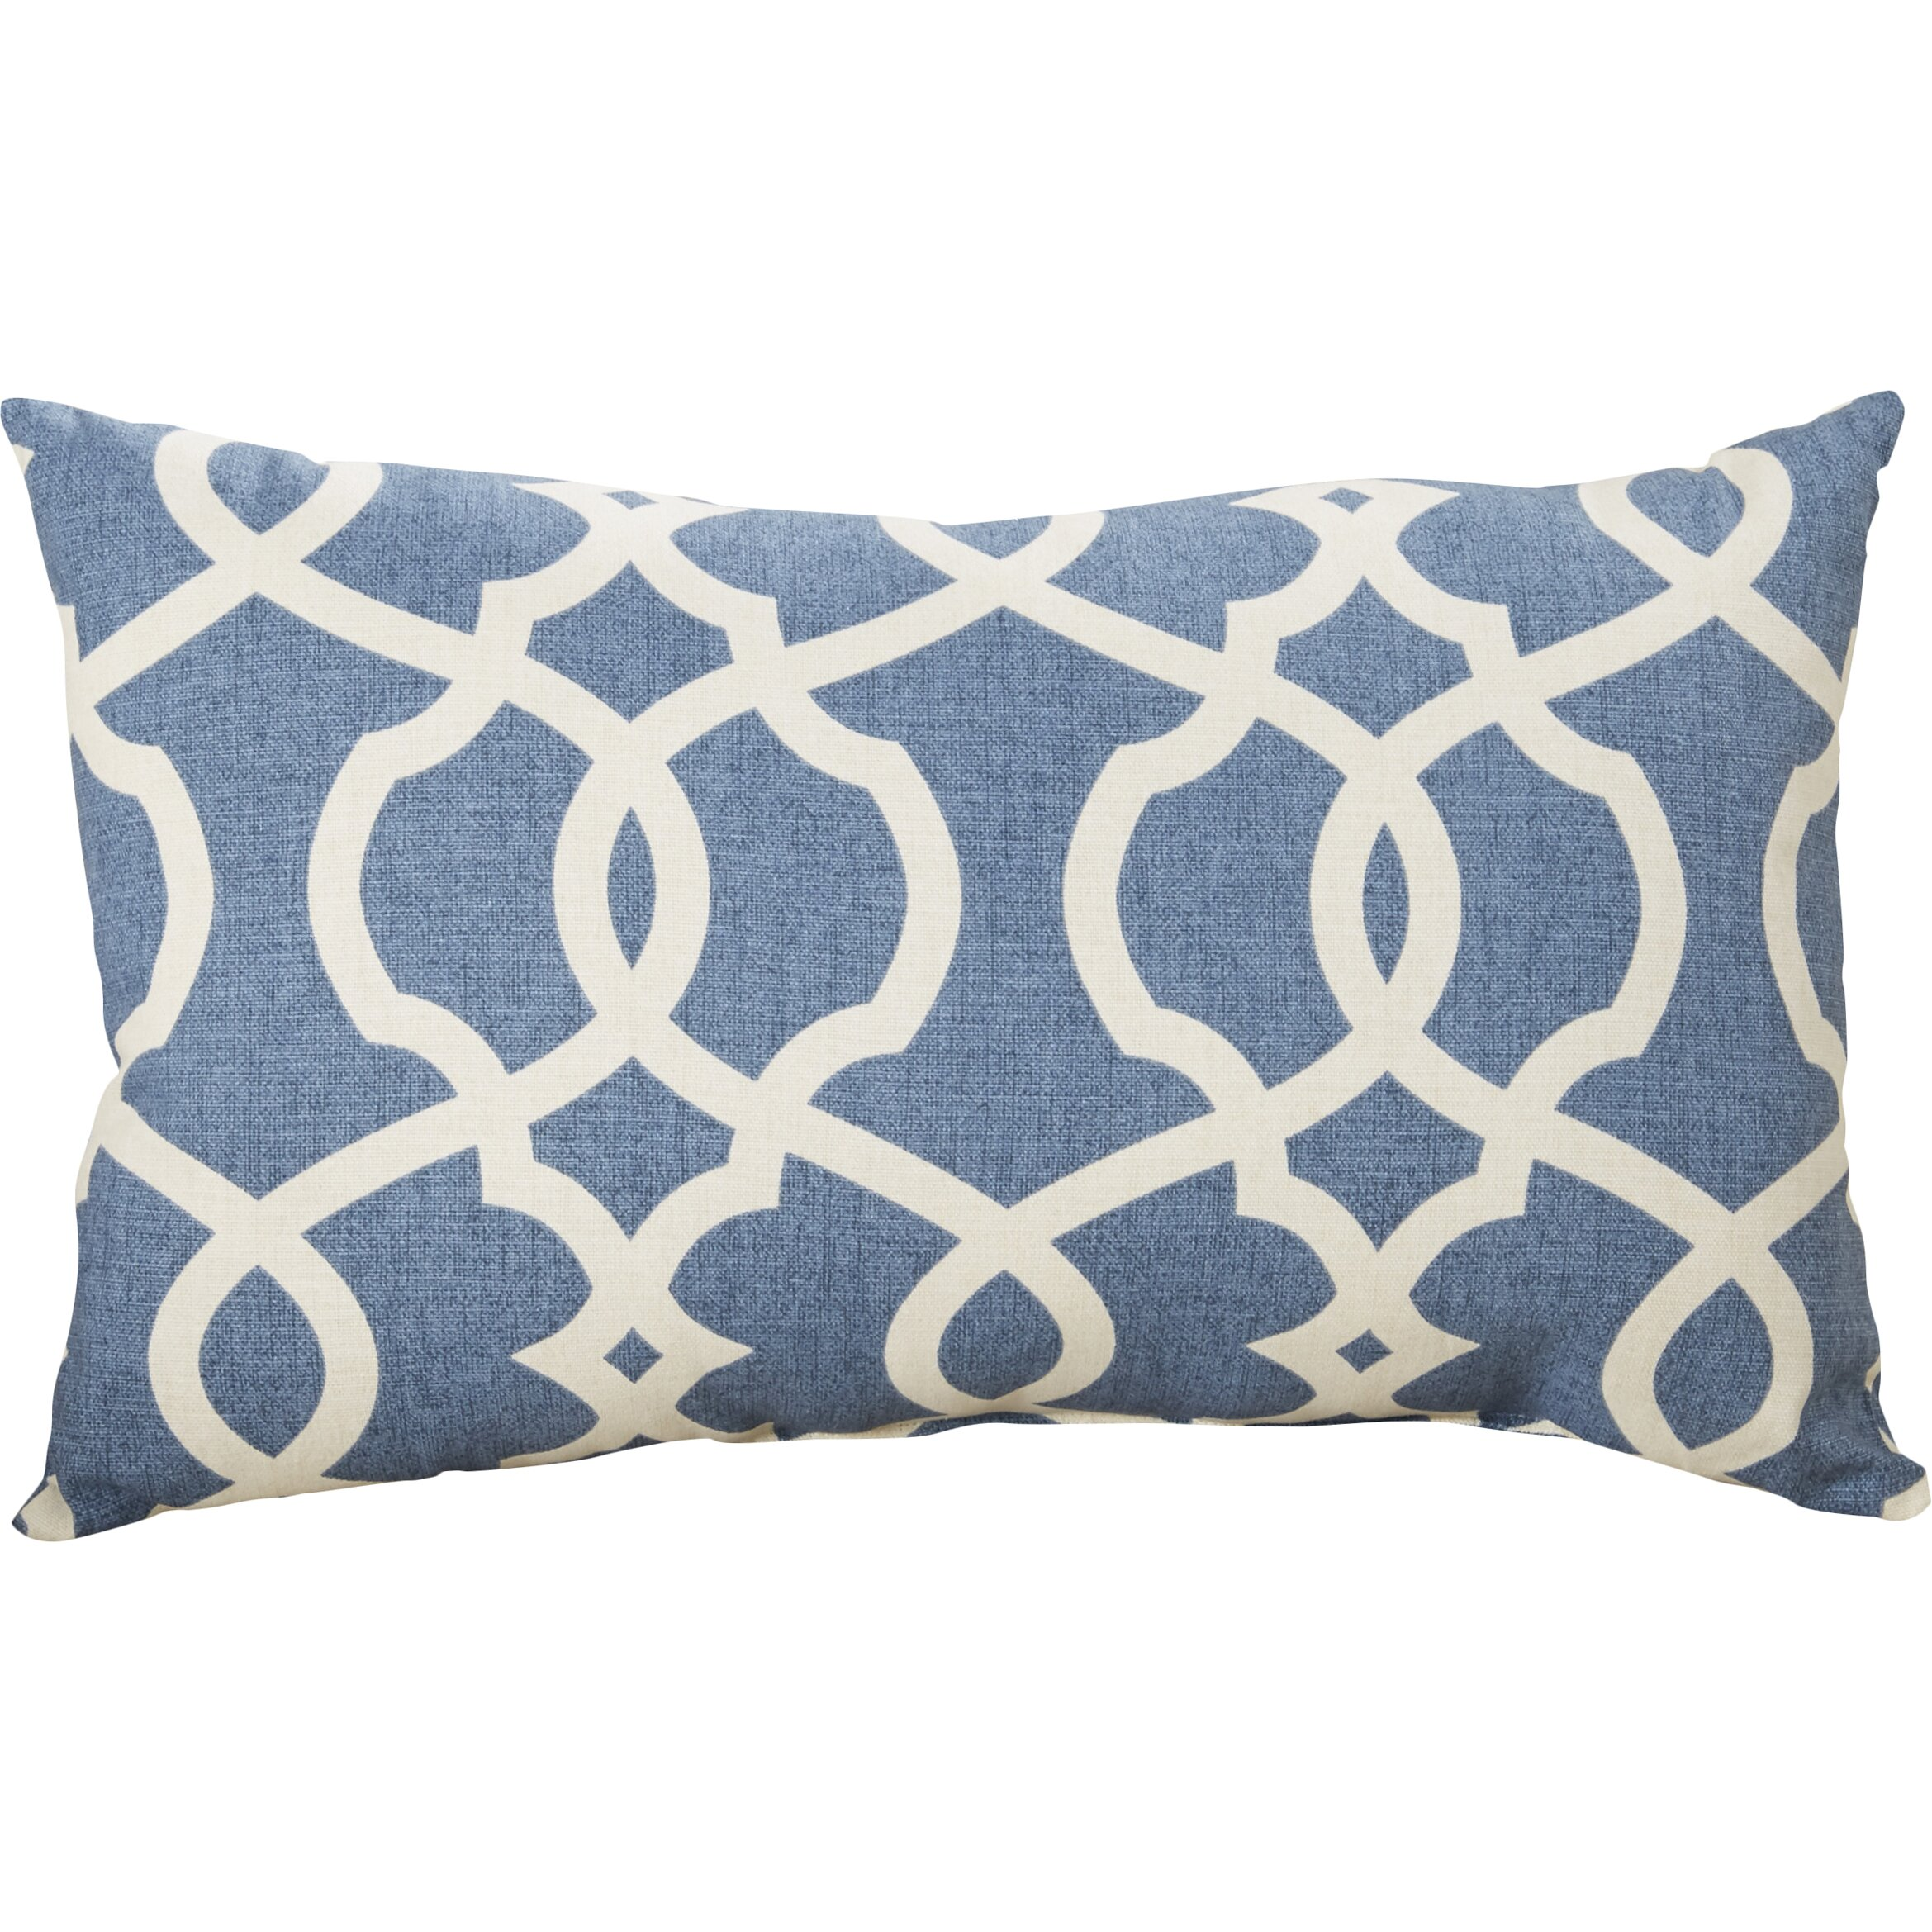 . Decorative Pillows   Throw Pillows You ll Love   Wayfair